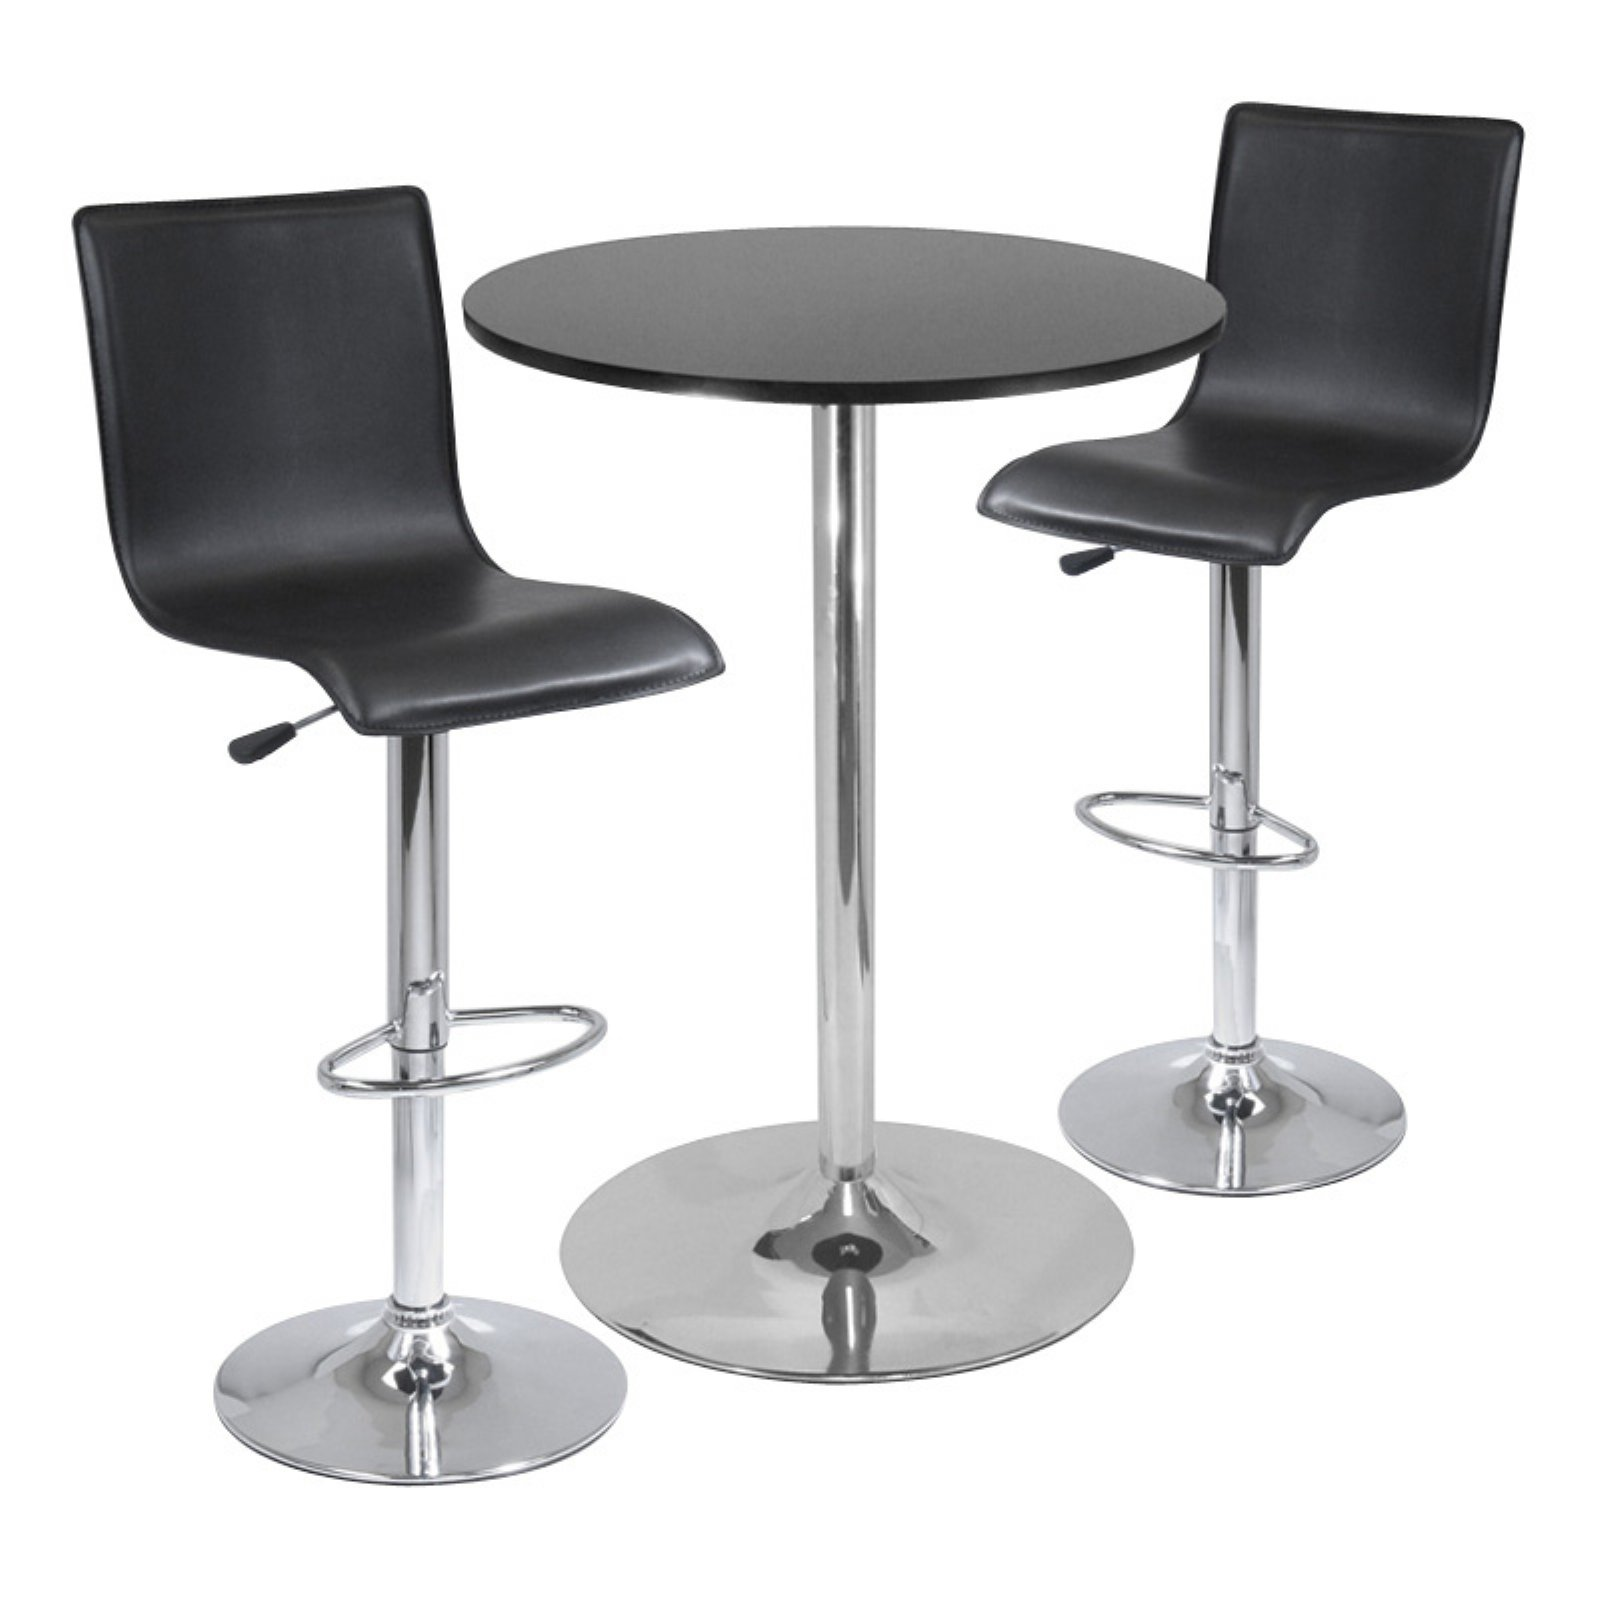 Winsome Wood Spectrum Pub Table & Stools, 3PC Set, Black & Chrome